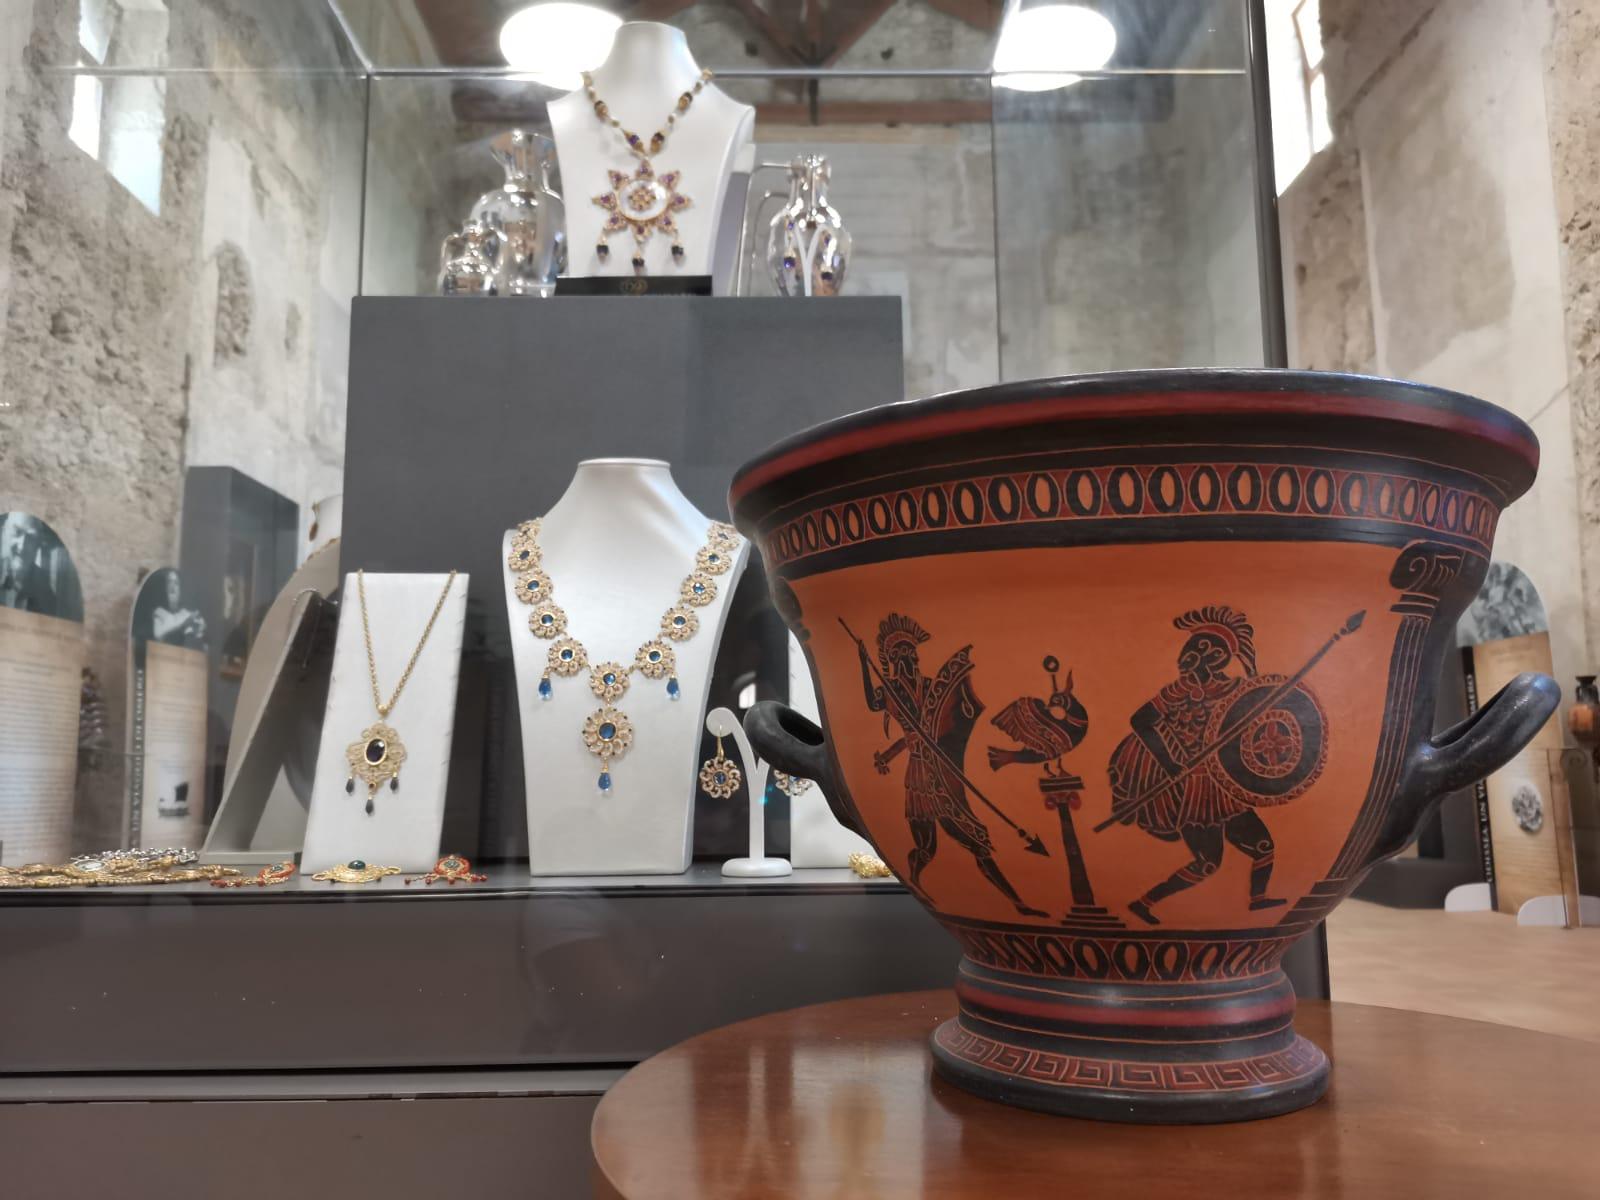 Odissea Museum, il museo di Ulisse a Tropea